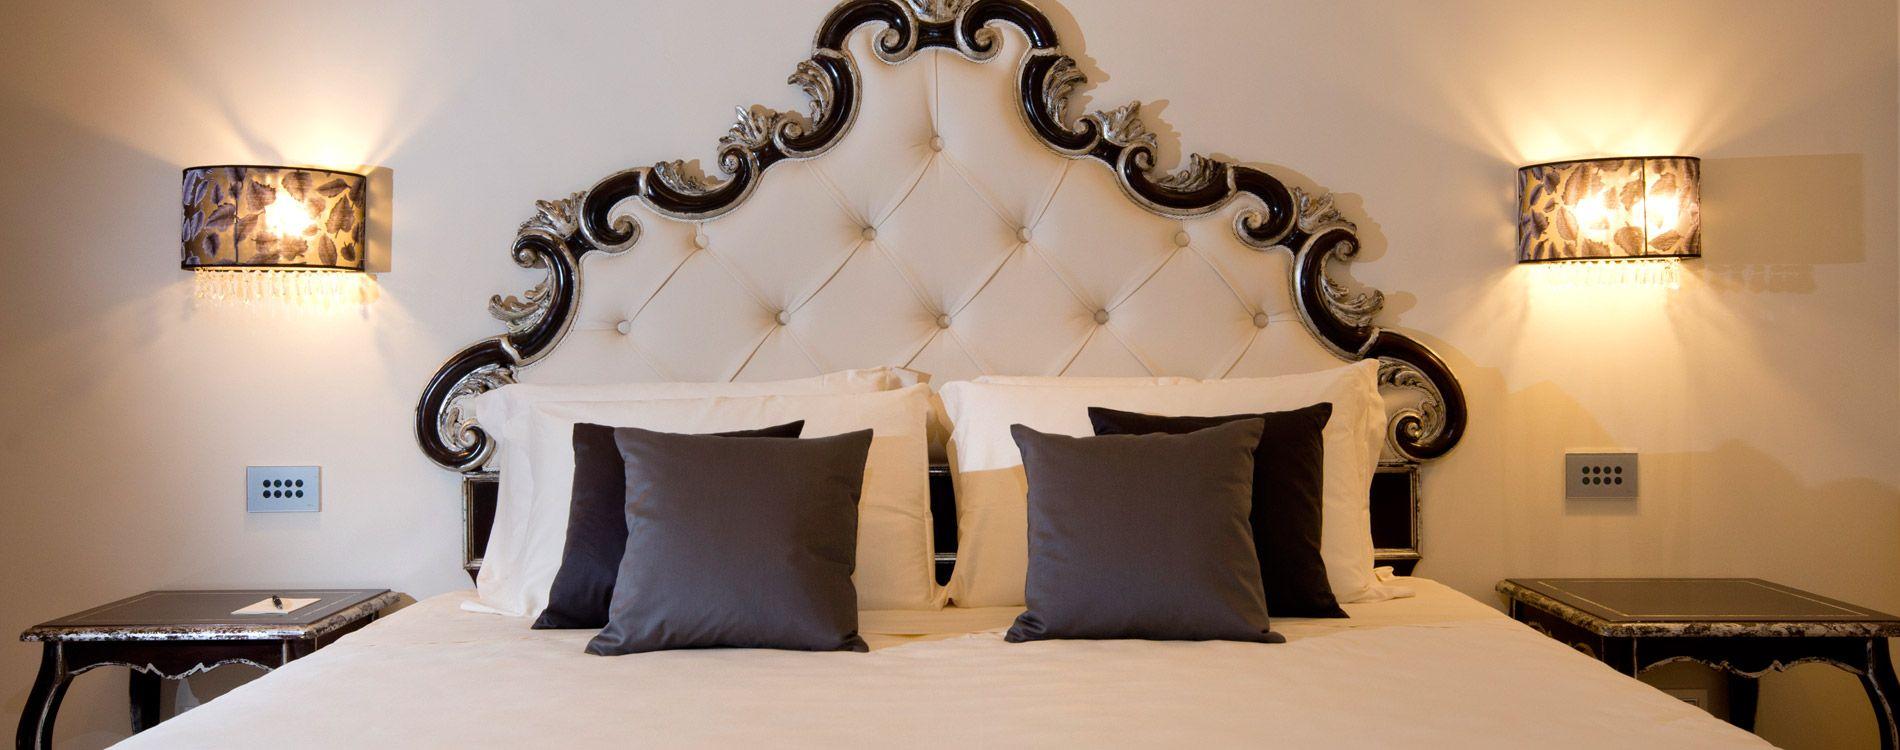 Grand Hotel da Vinci, Cesenatico *****5 Star Hotel